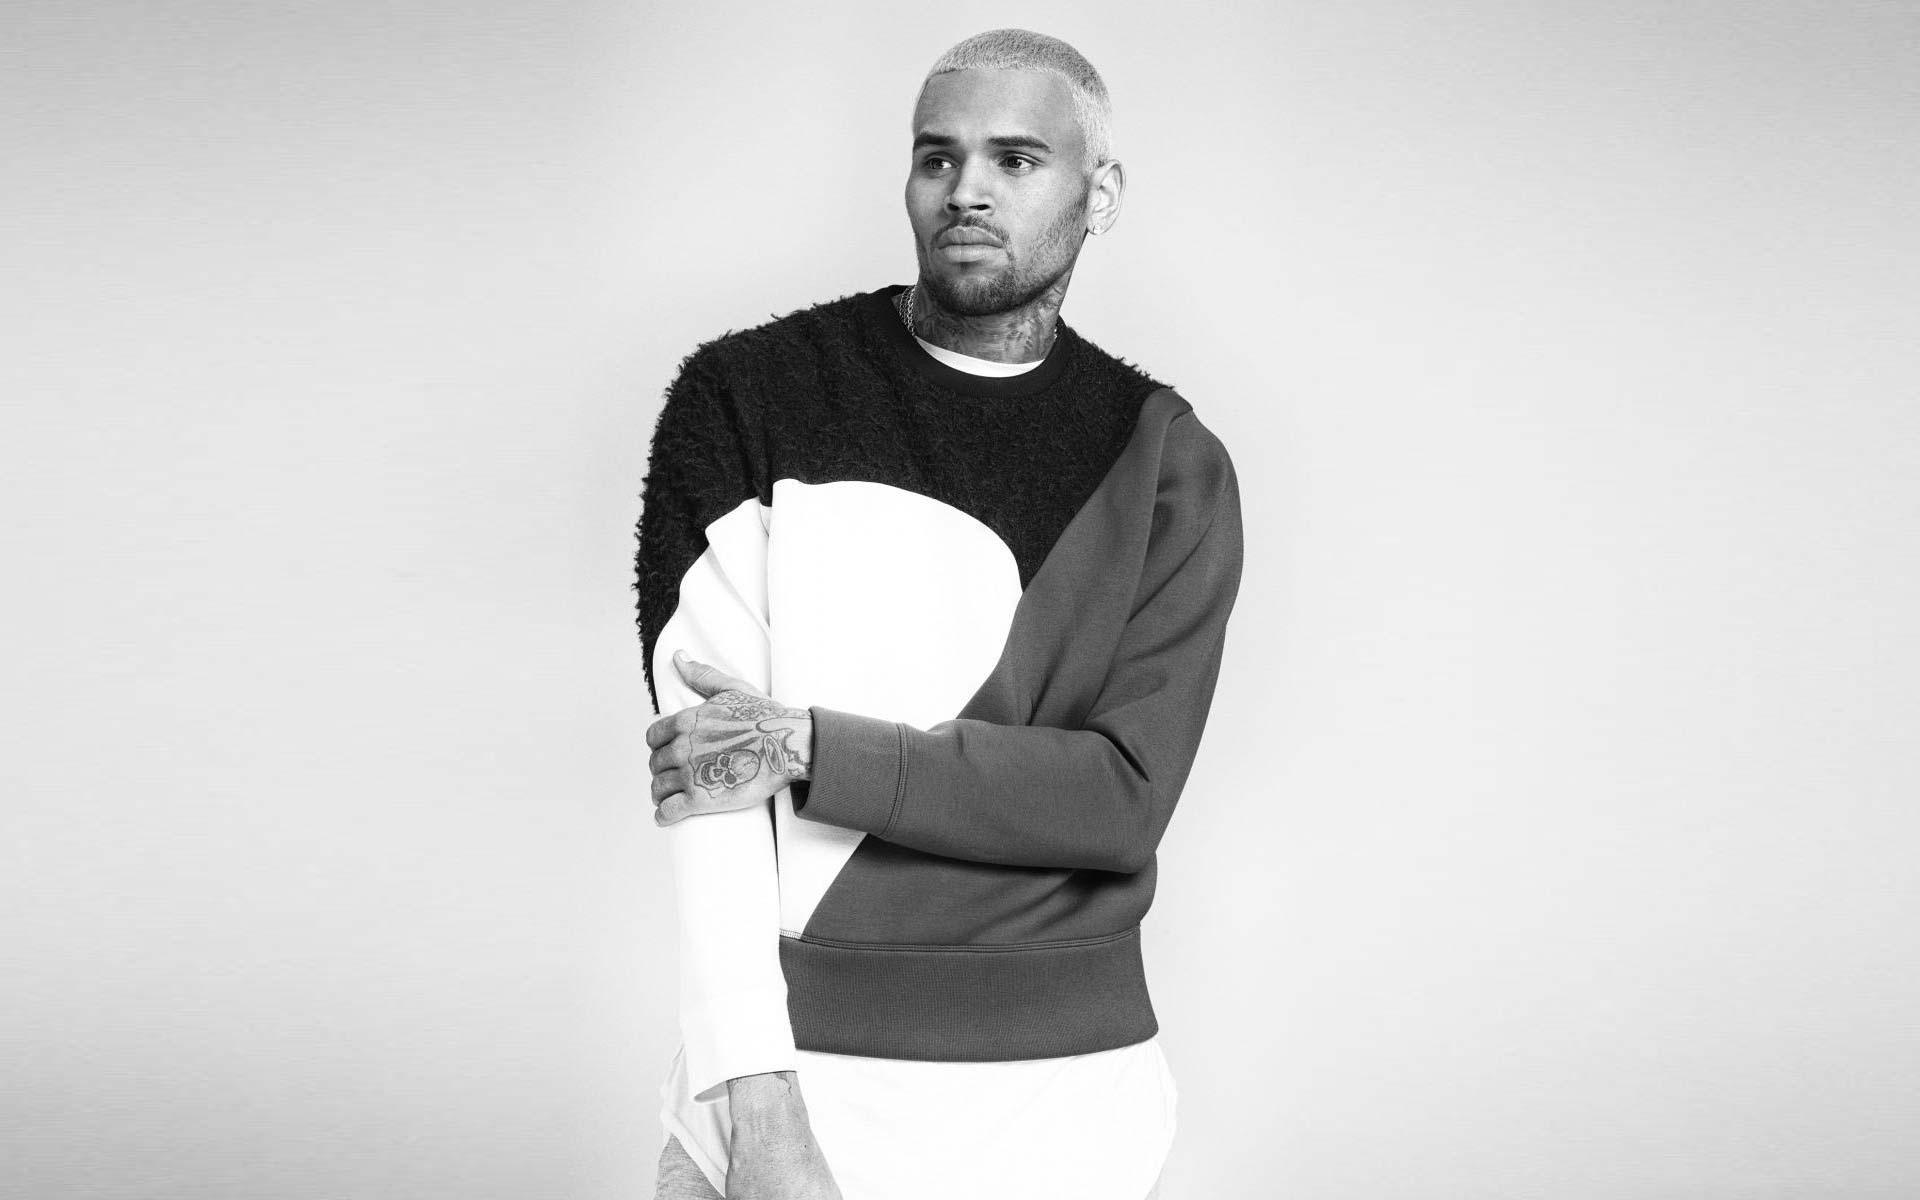 Chris Brown Background